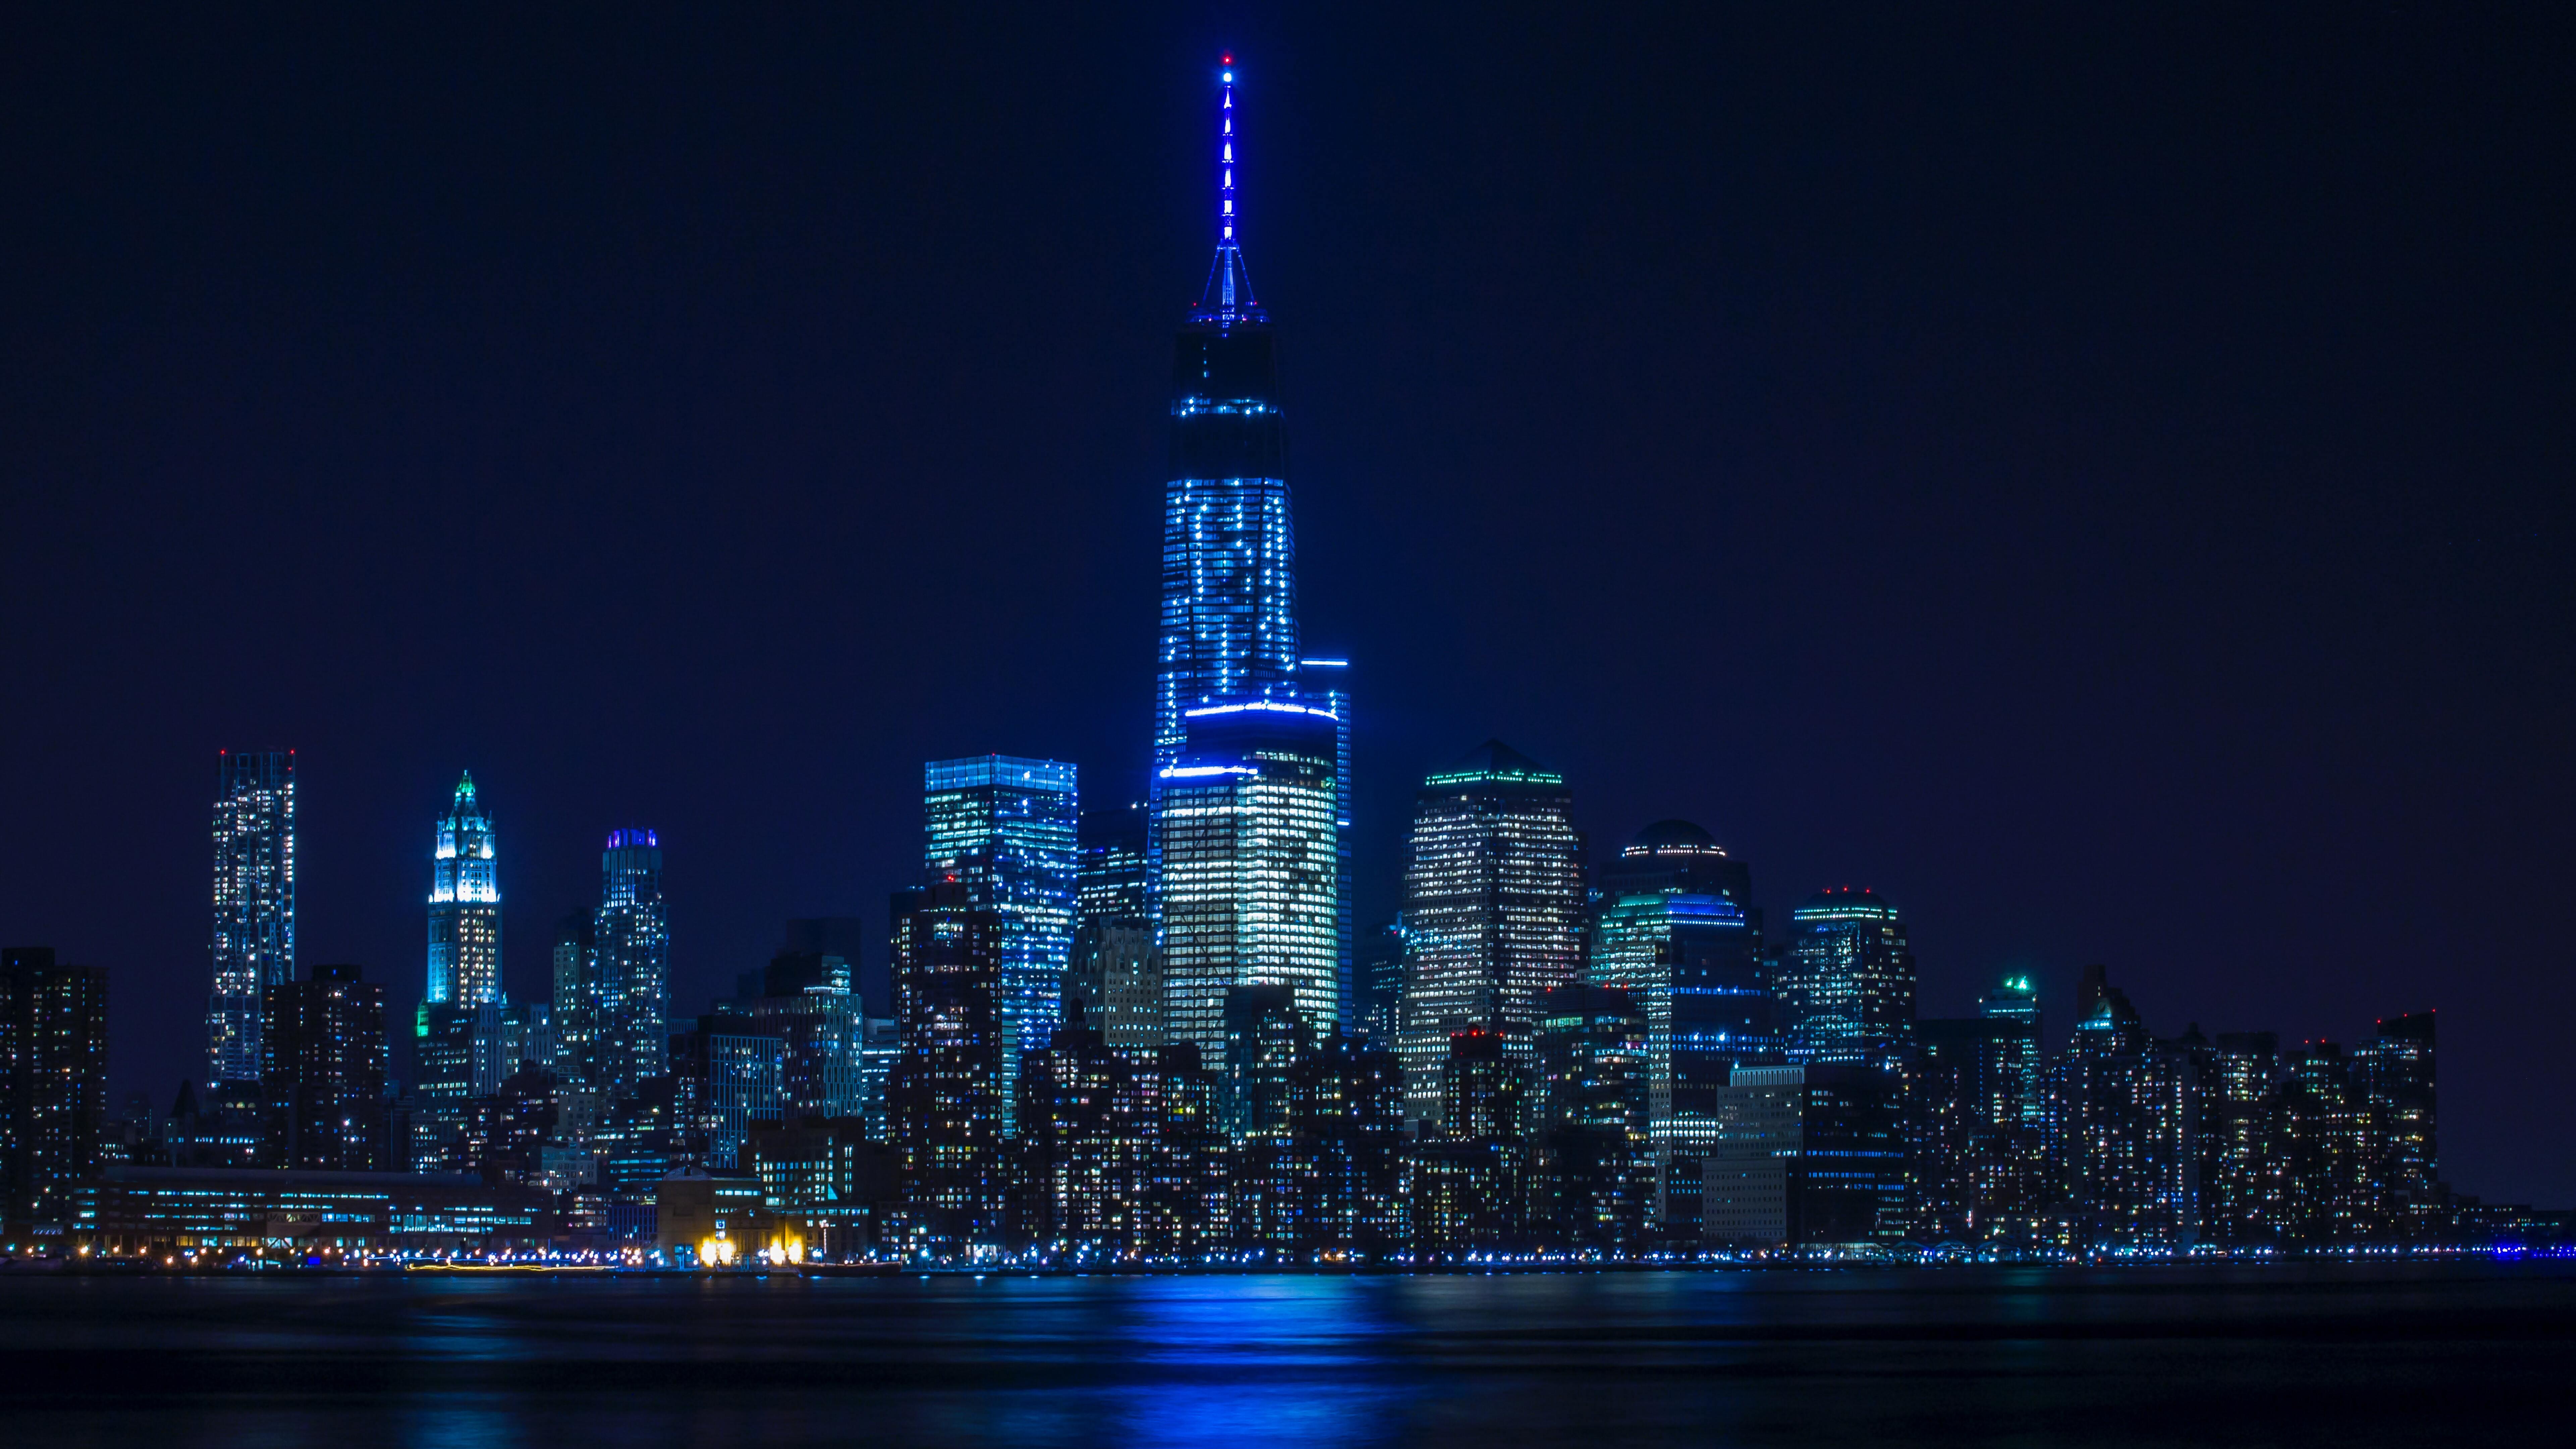 7680x4320 Blue Light Buildings Architecture 8k 8k Hd 4k